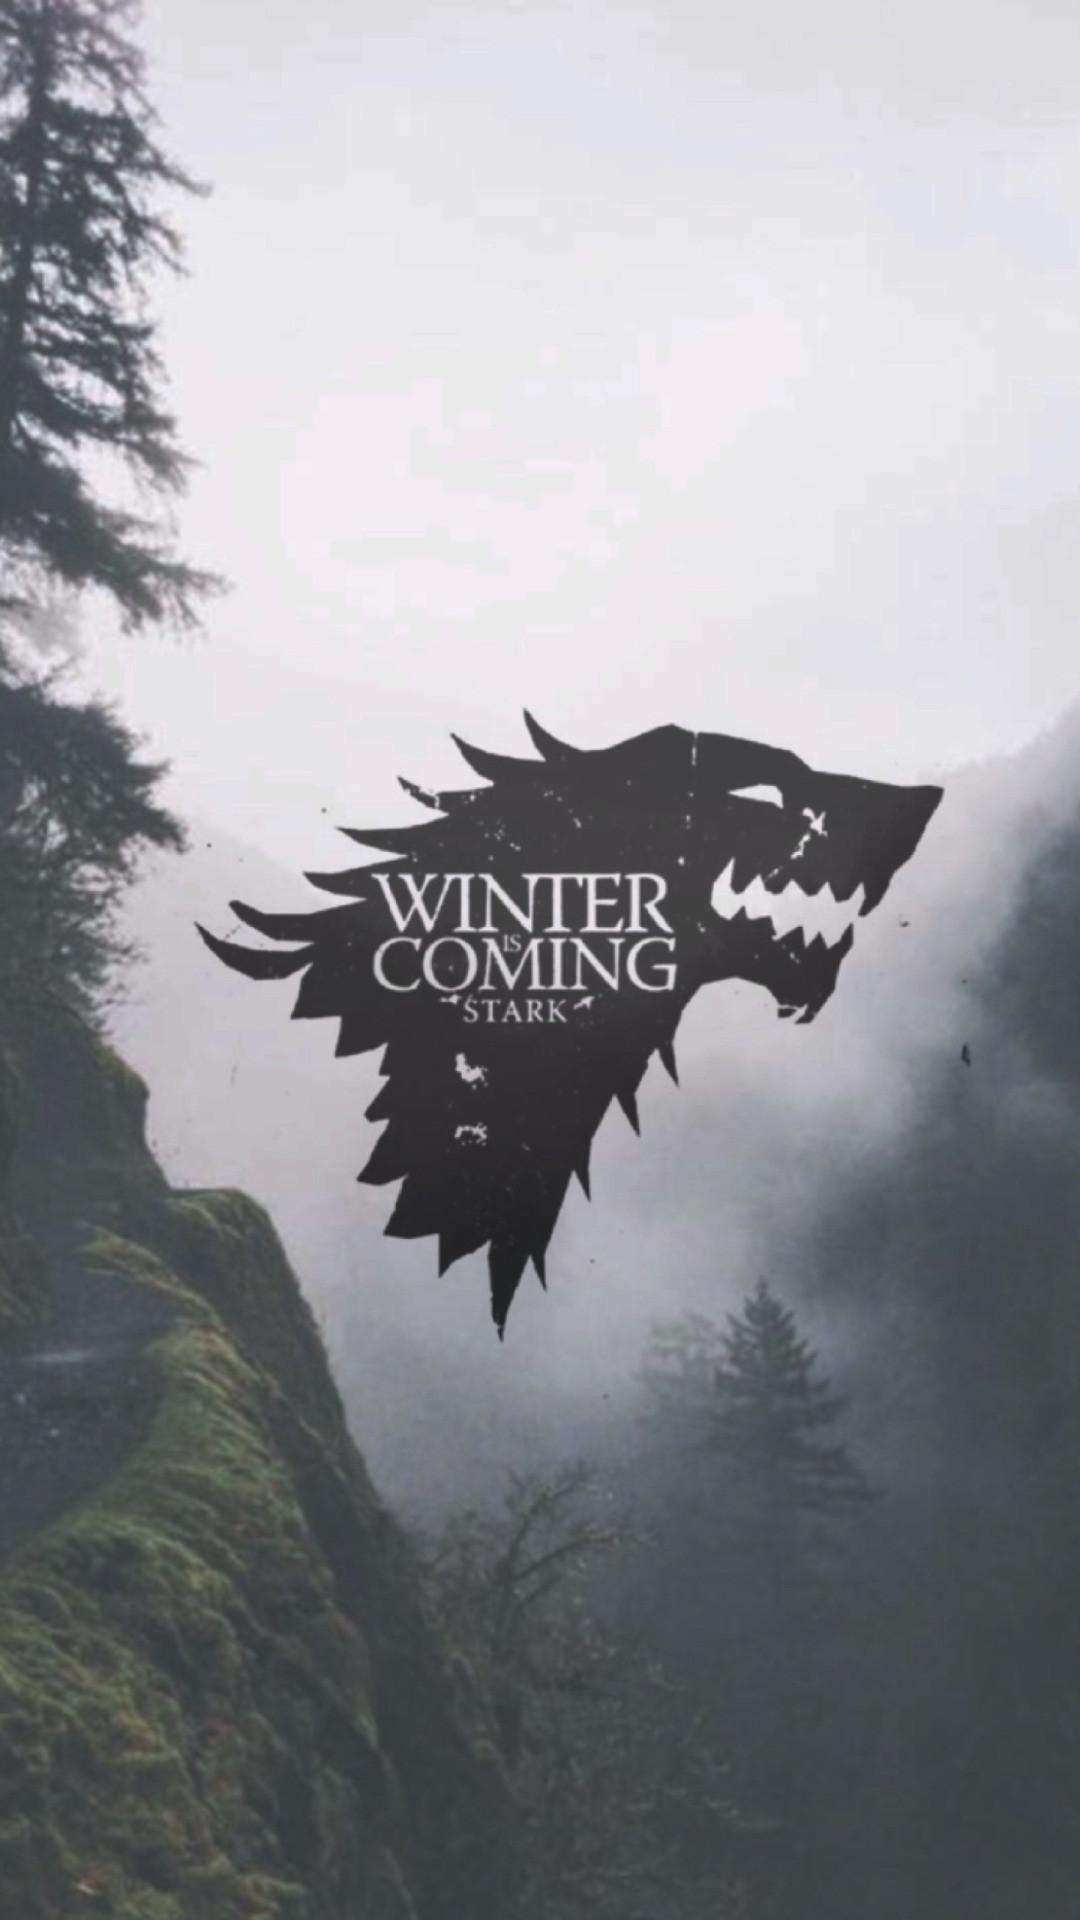 1920x1080 Preview Wallpaper Game Of Thrones Emblems House Stark Targaryen Baratheon